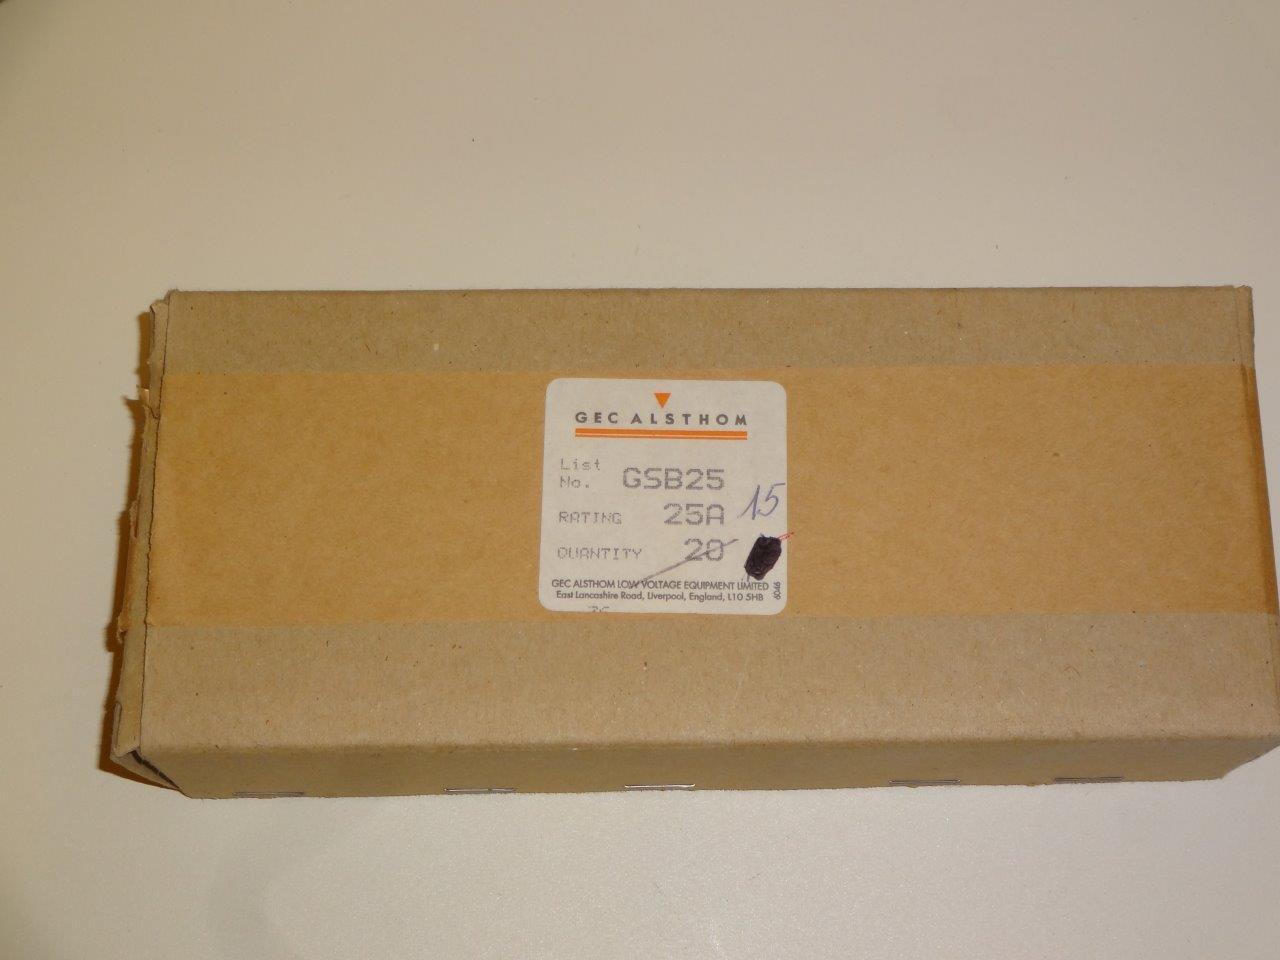 Gsb25 Fuses Gec Alsthom Lwd Weutscheck Distributor Obsolete Ge Fuse Box Bargain Offer